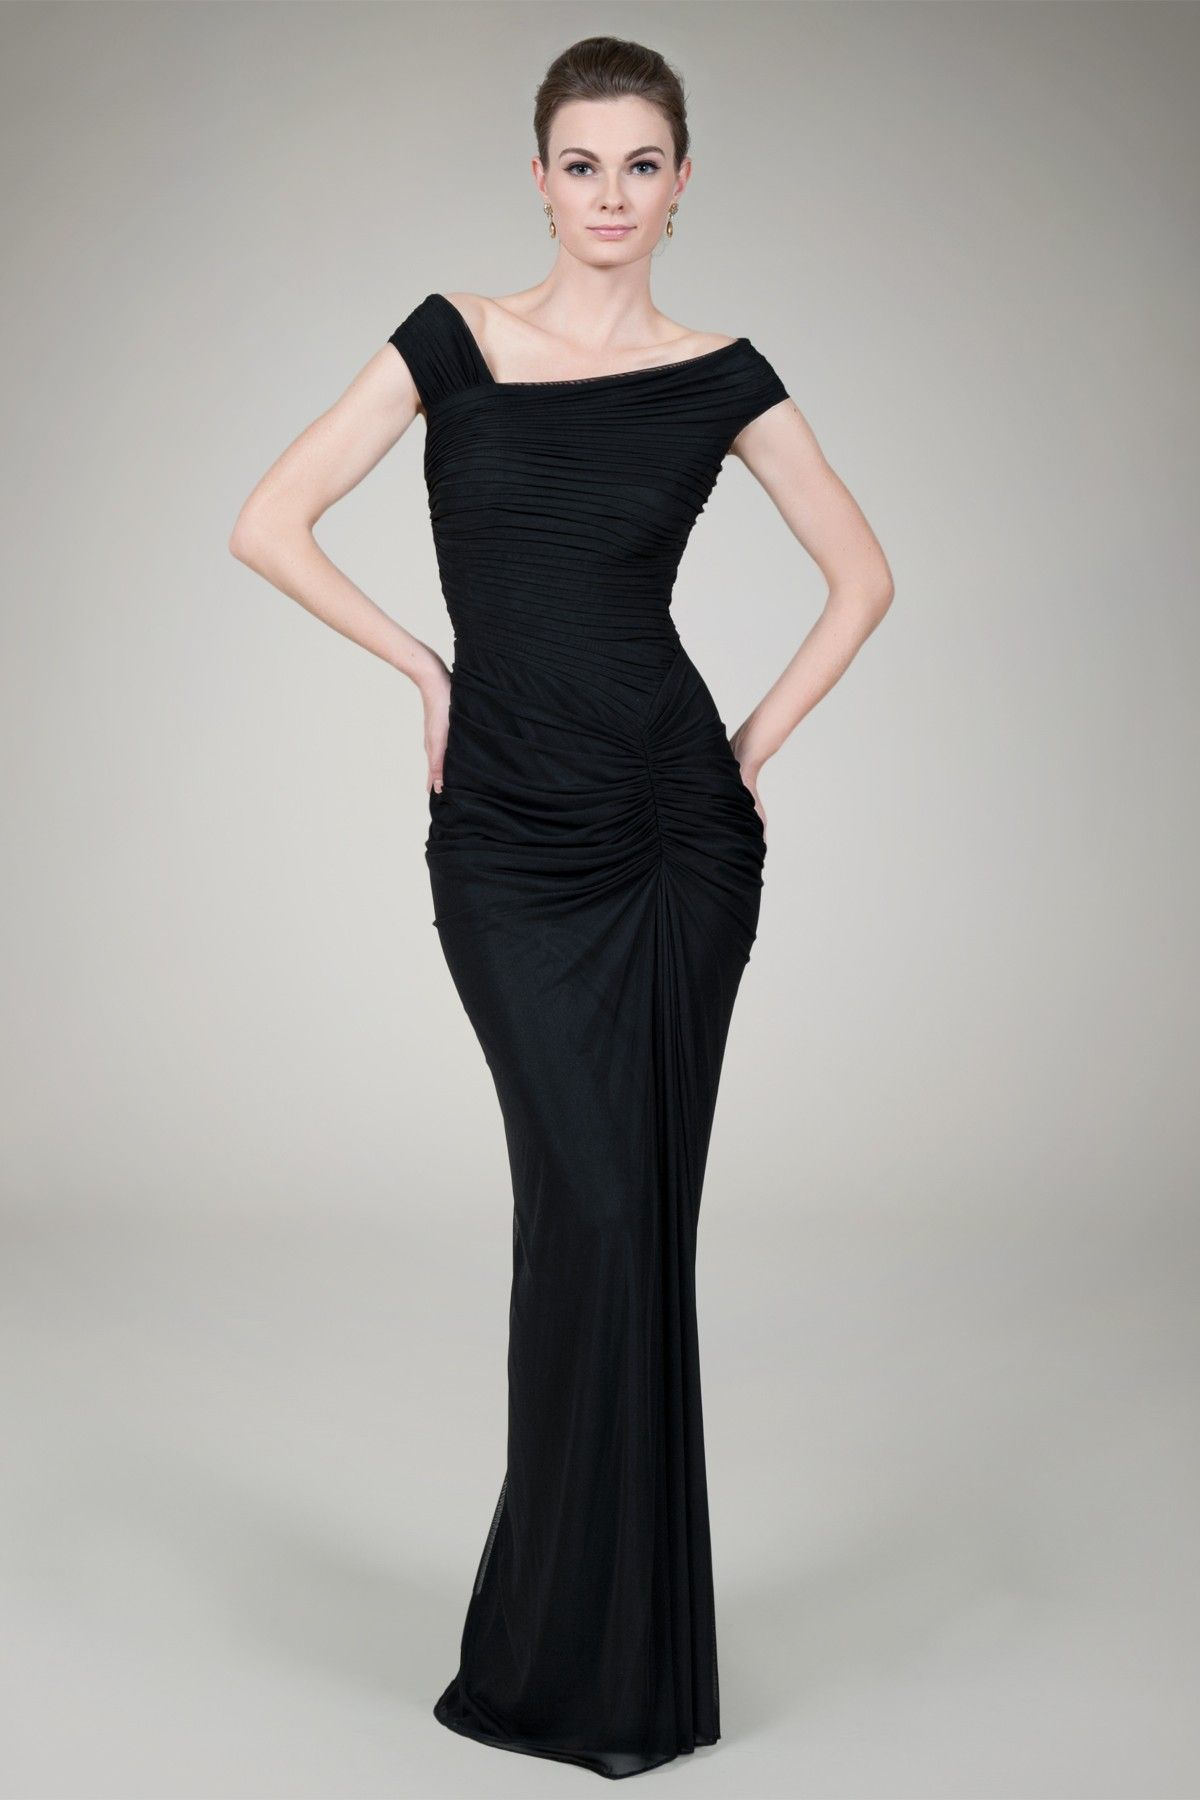 Tadashi Shoji Asymmetrical Ruched Gown In Black Wore This To My Son S Military Ball Very Affordable Gowns Vestido Maravilloso Vestidos De Fiesta Moda [ 1800 x 1200 Pixel ]